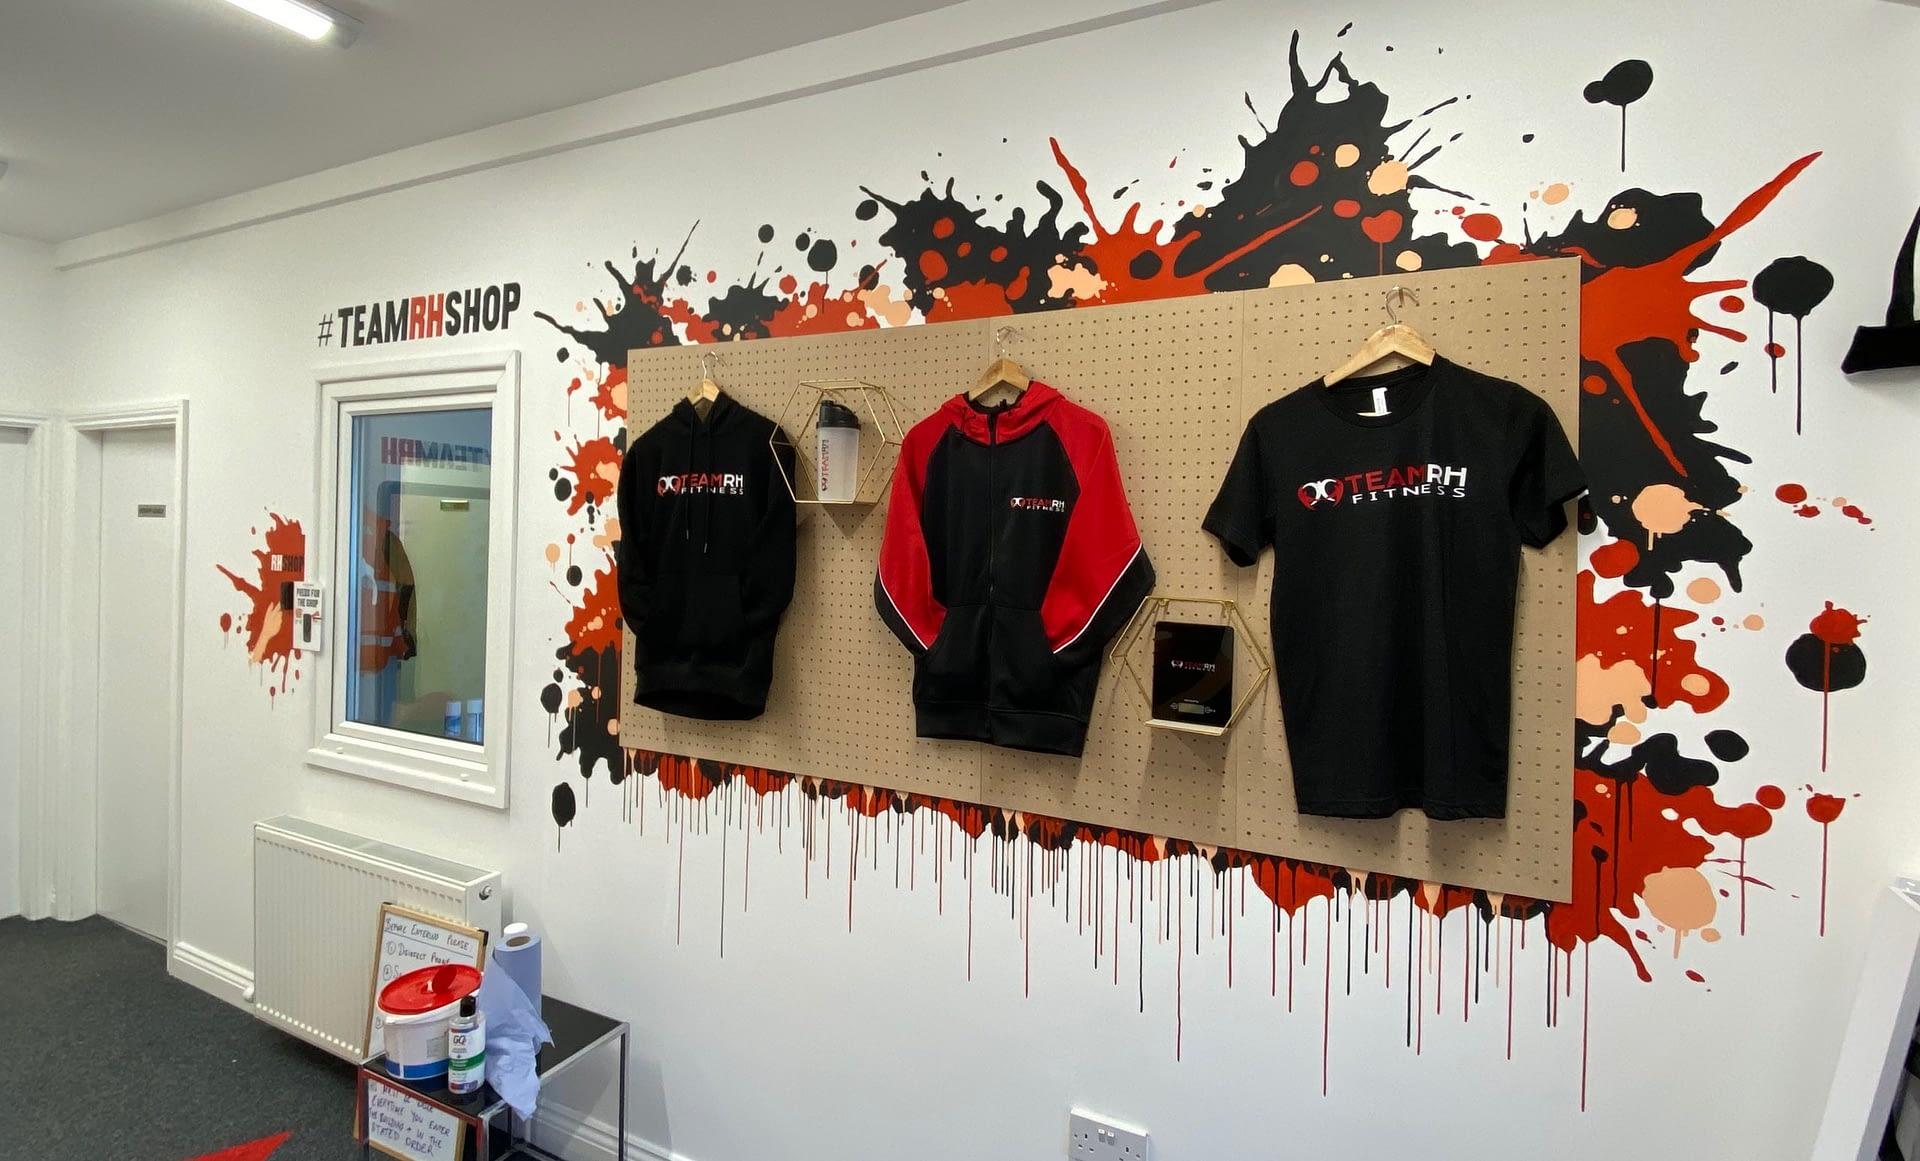 Team RH Shop